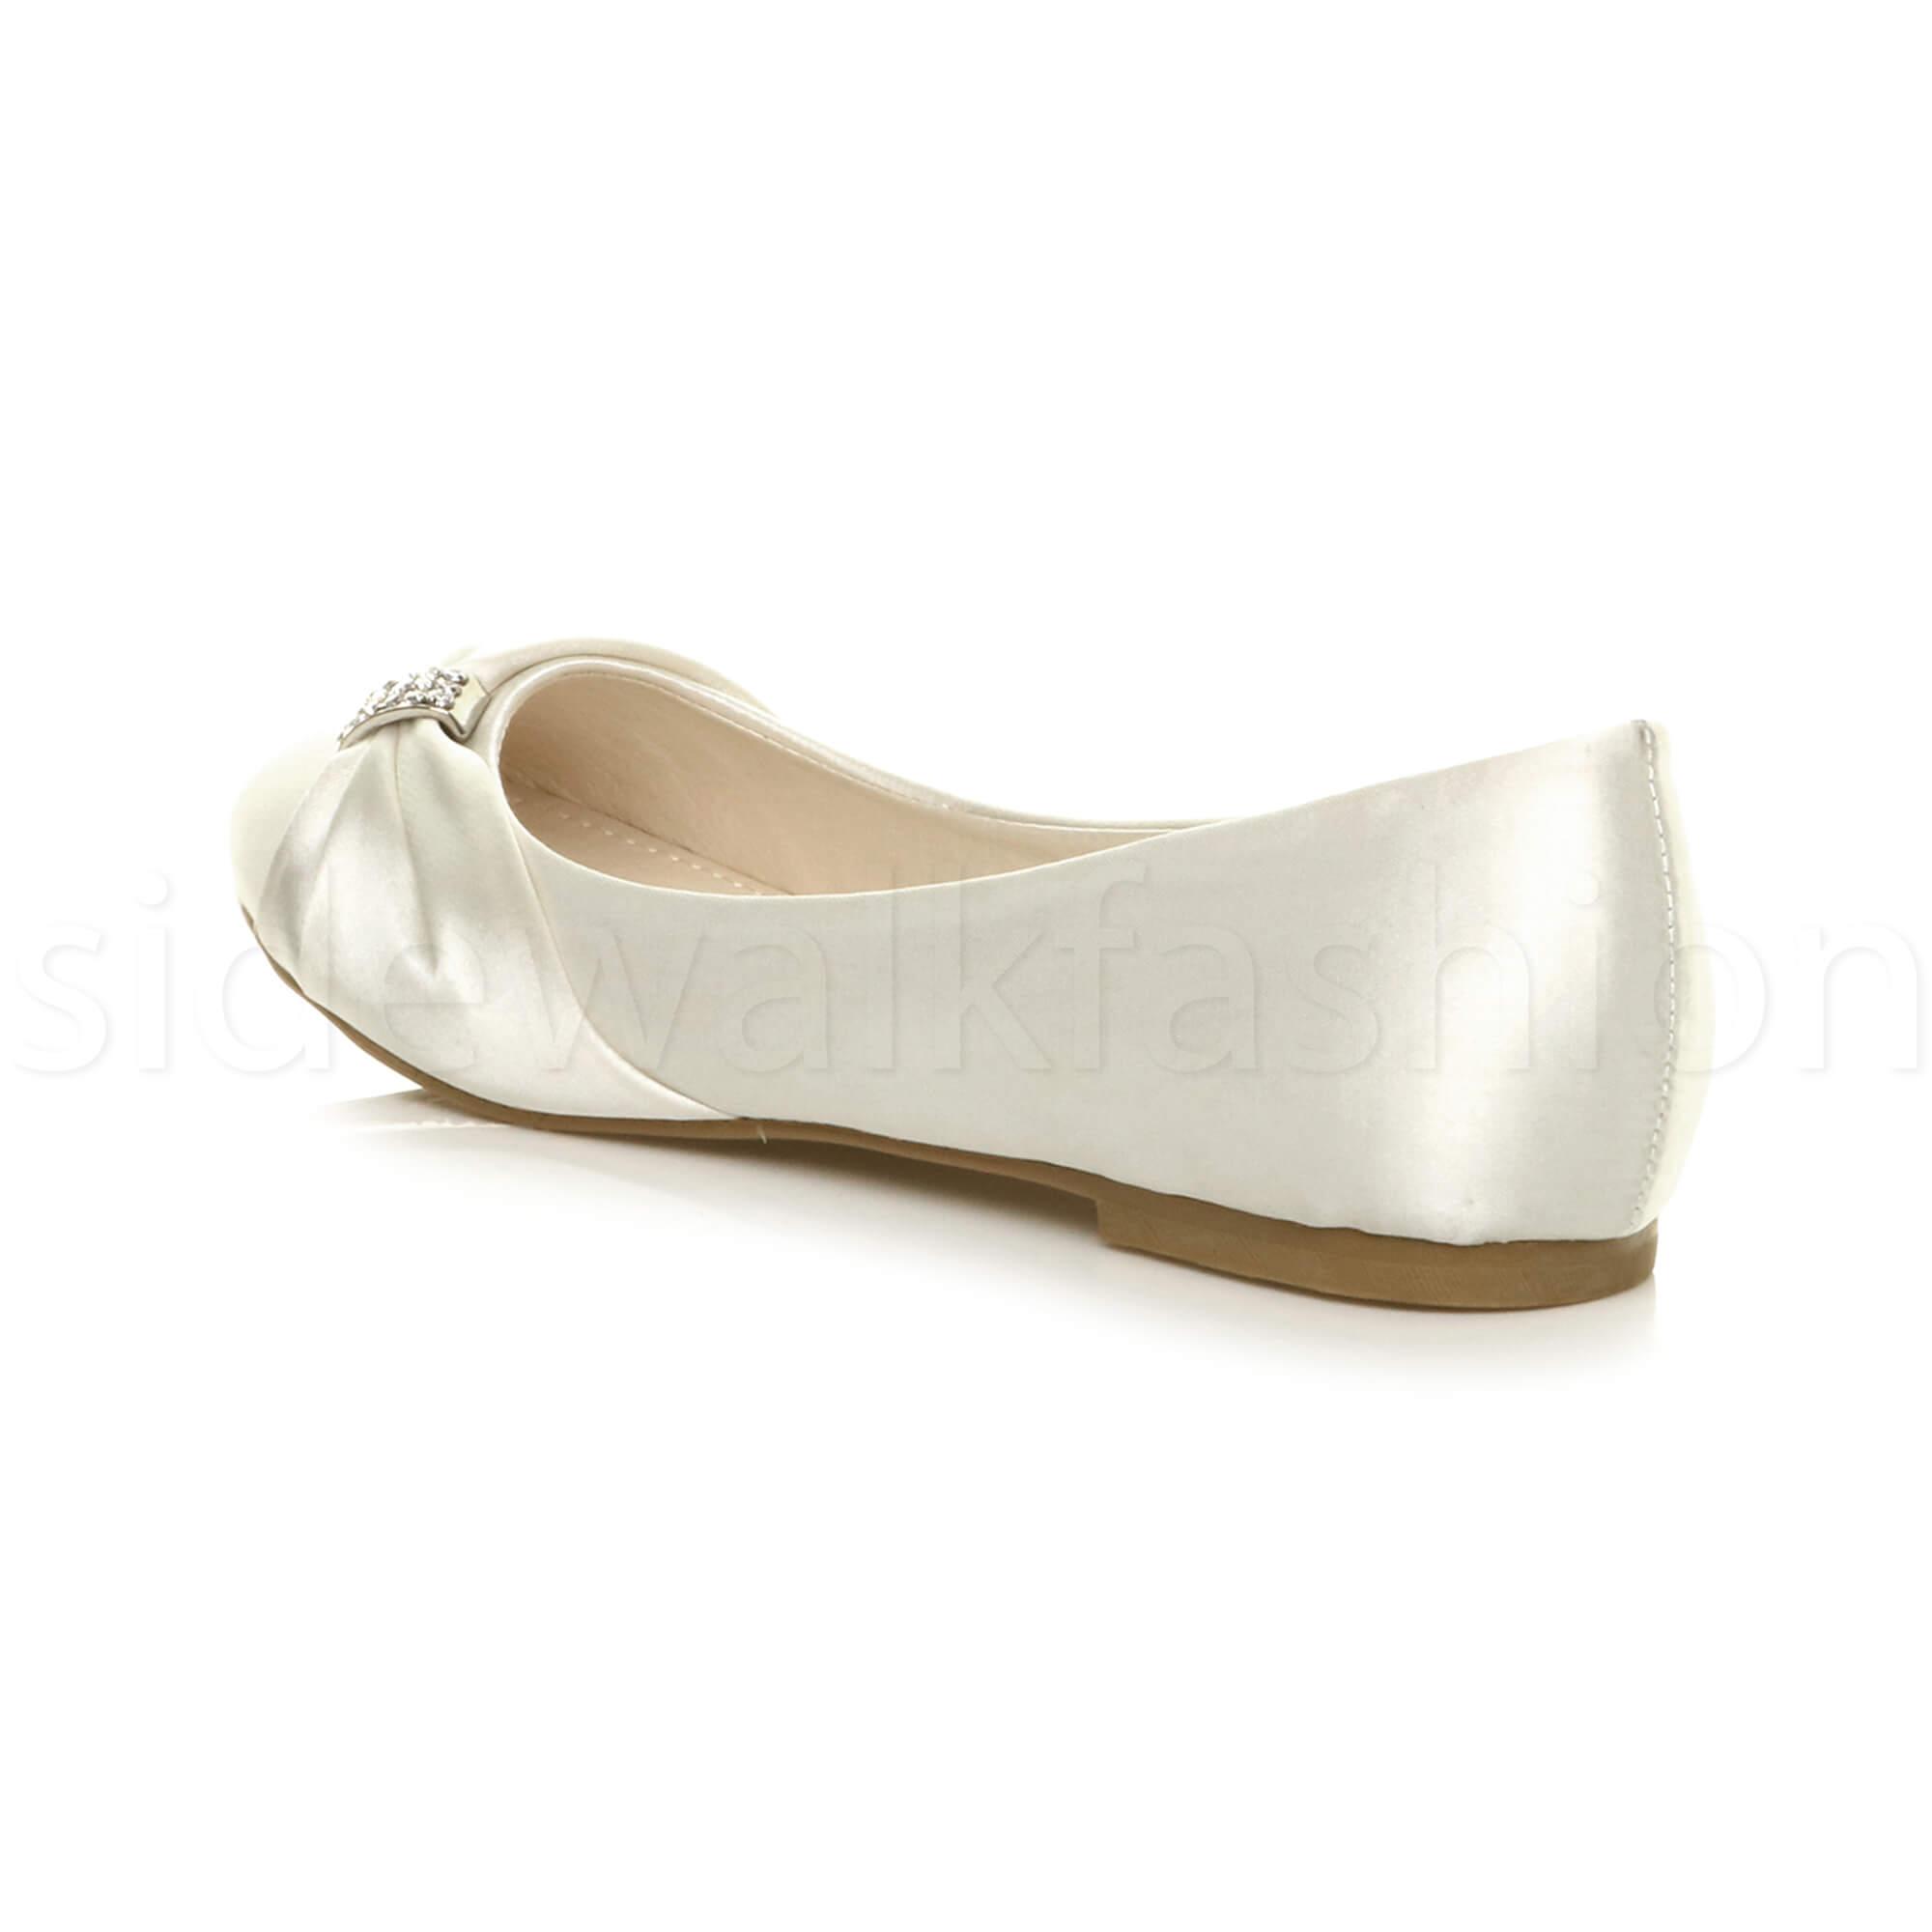 Womens-ladies-flat-wedding-bridesmaid-ruched-diamante-bridal-shoes-pumps-size thumbnail 13